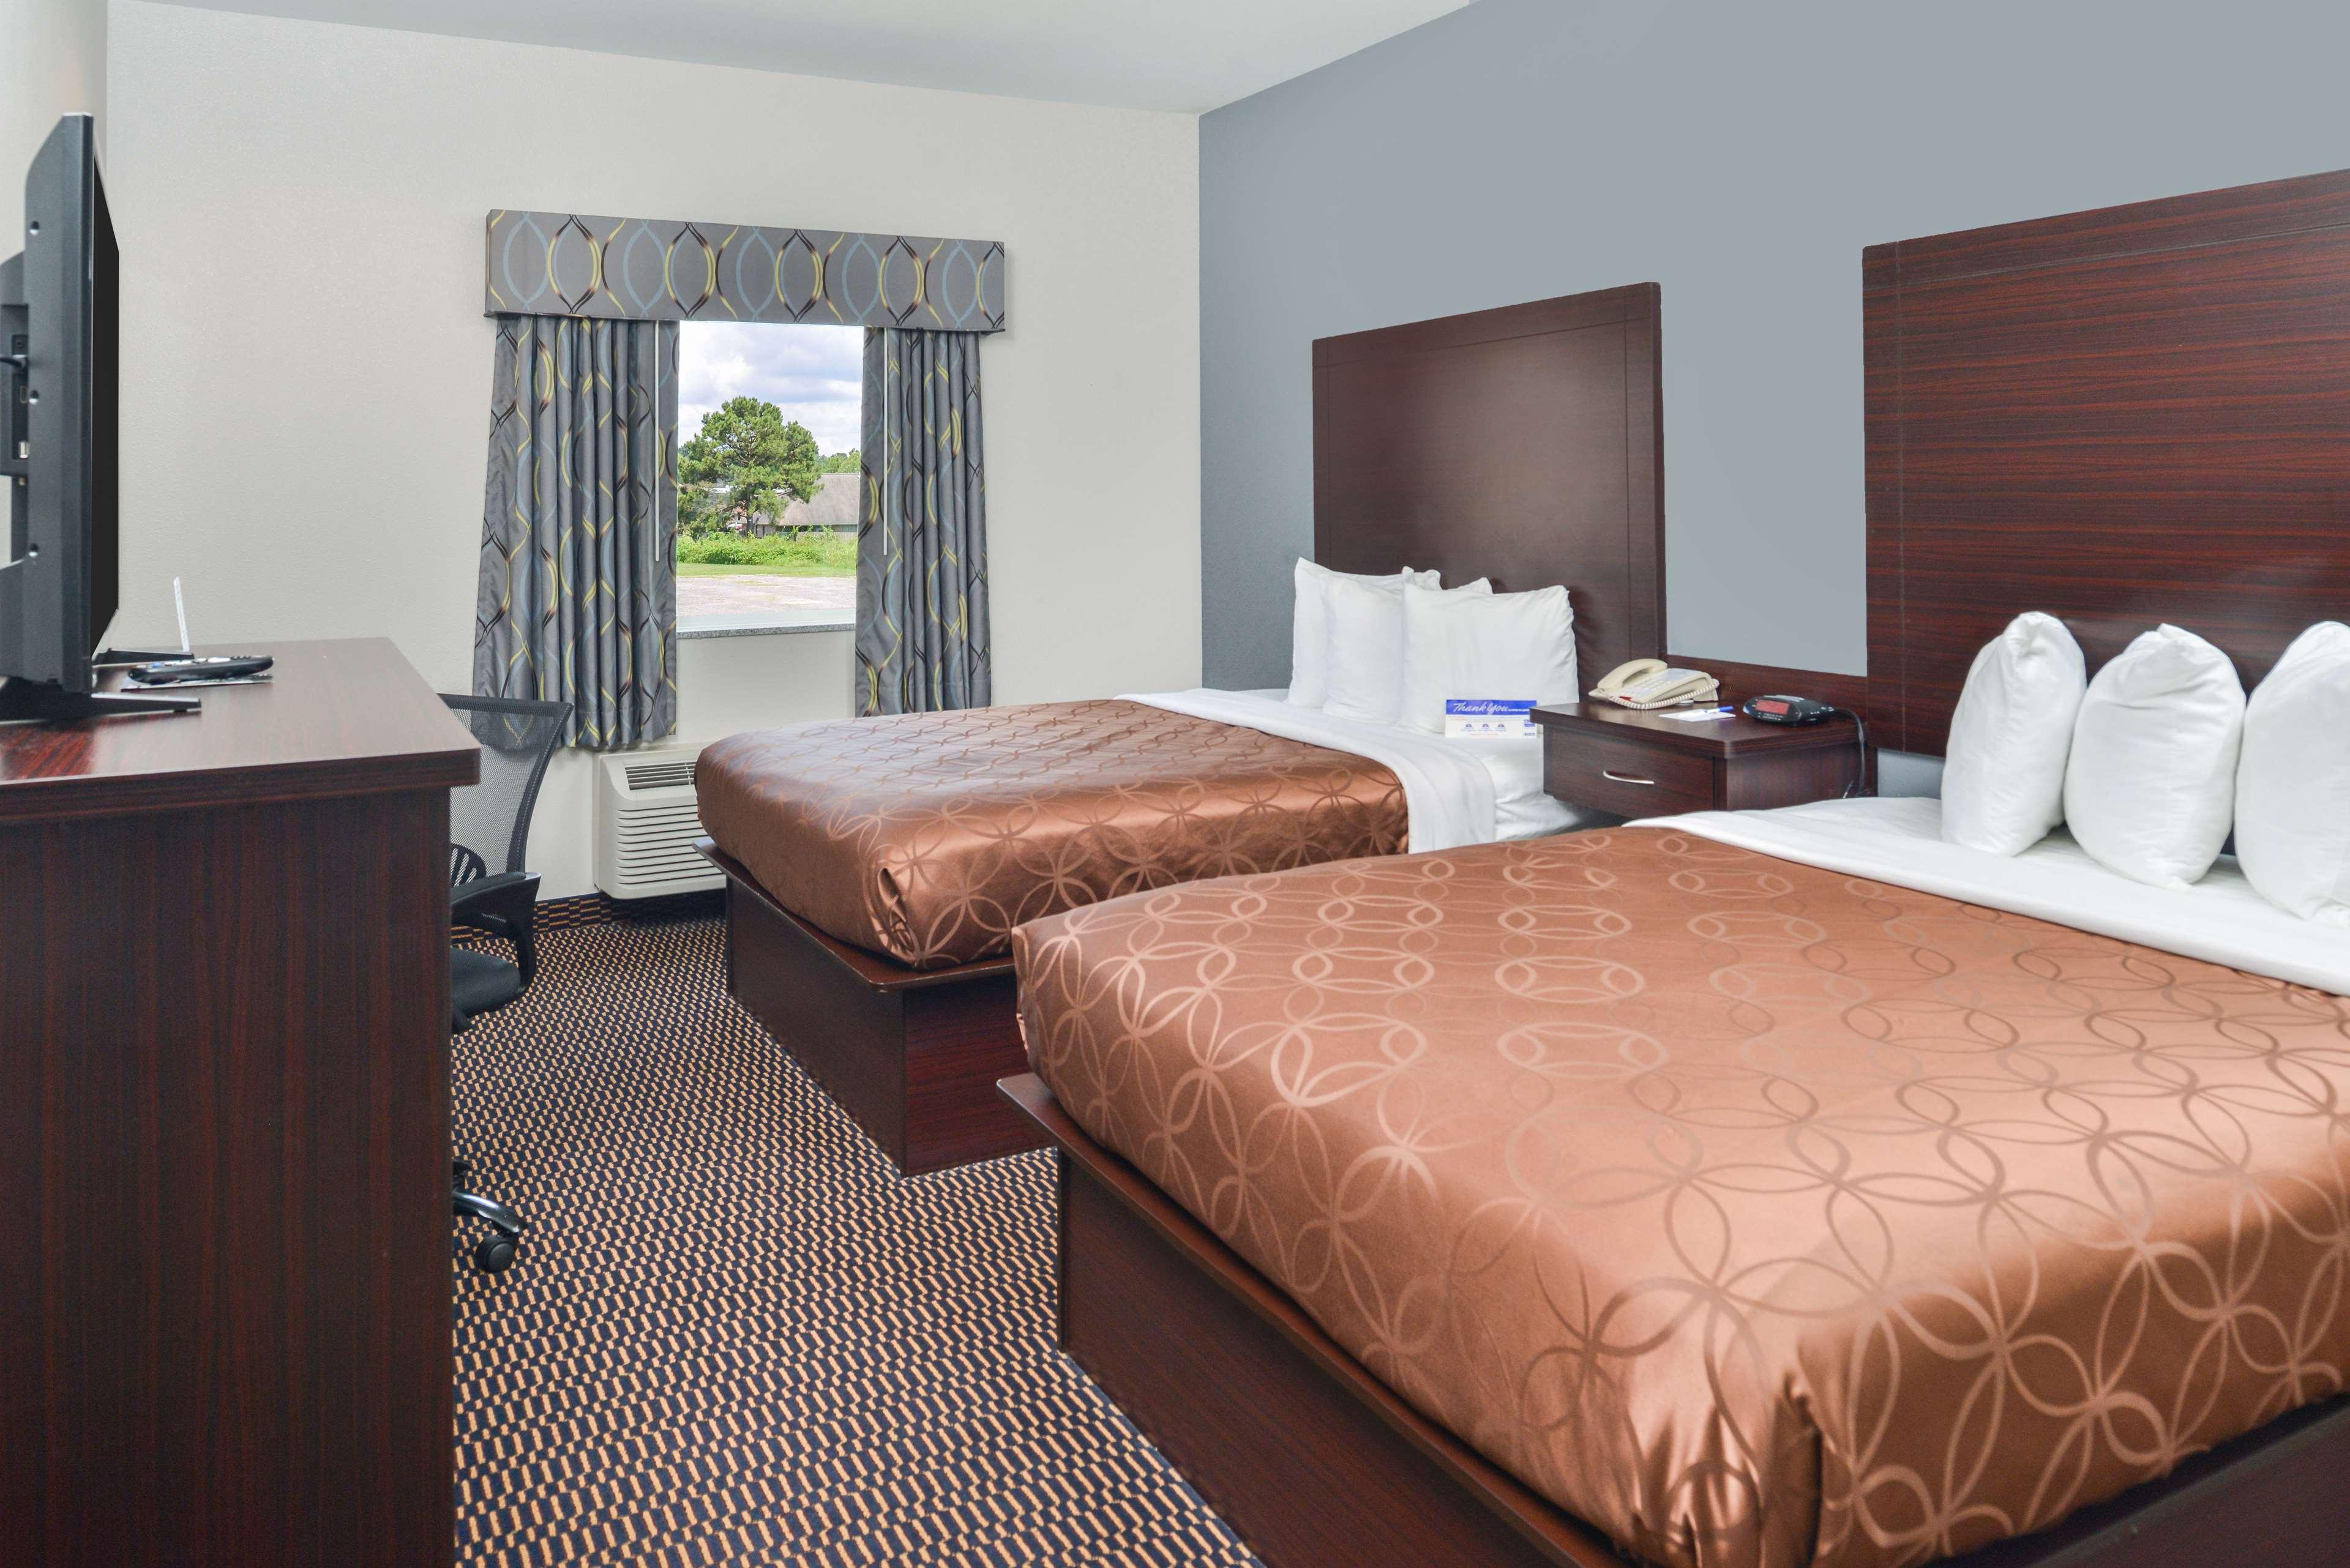 Americas Best Value Inn - Baton Rouge / College Drive image 12